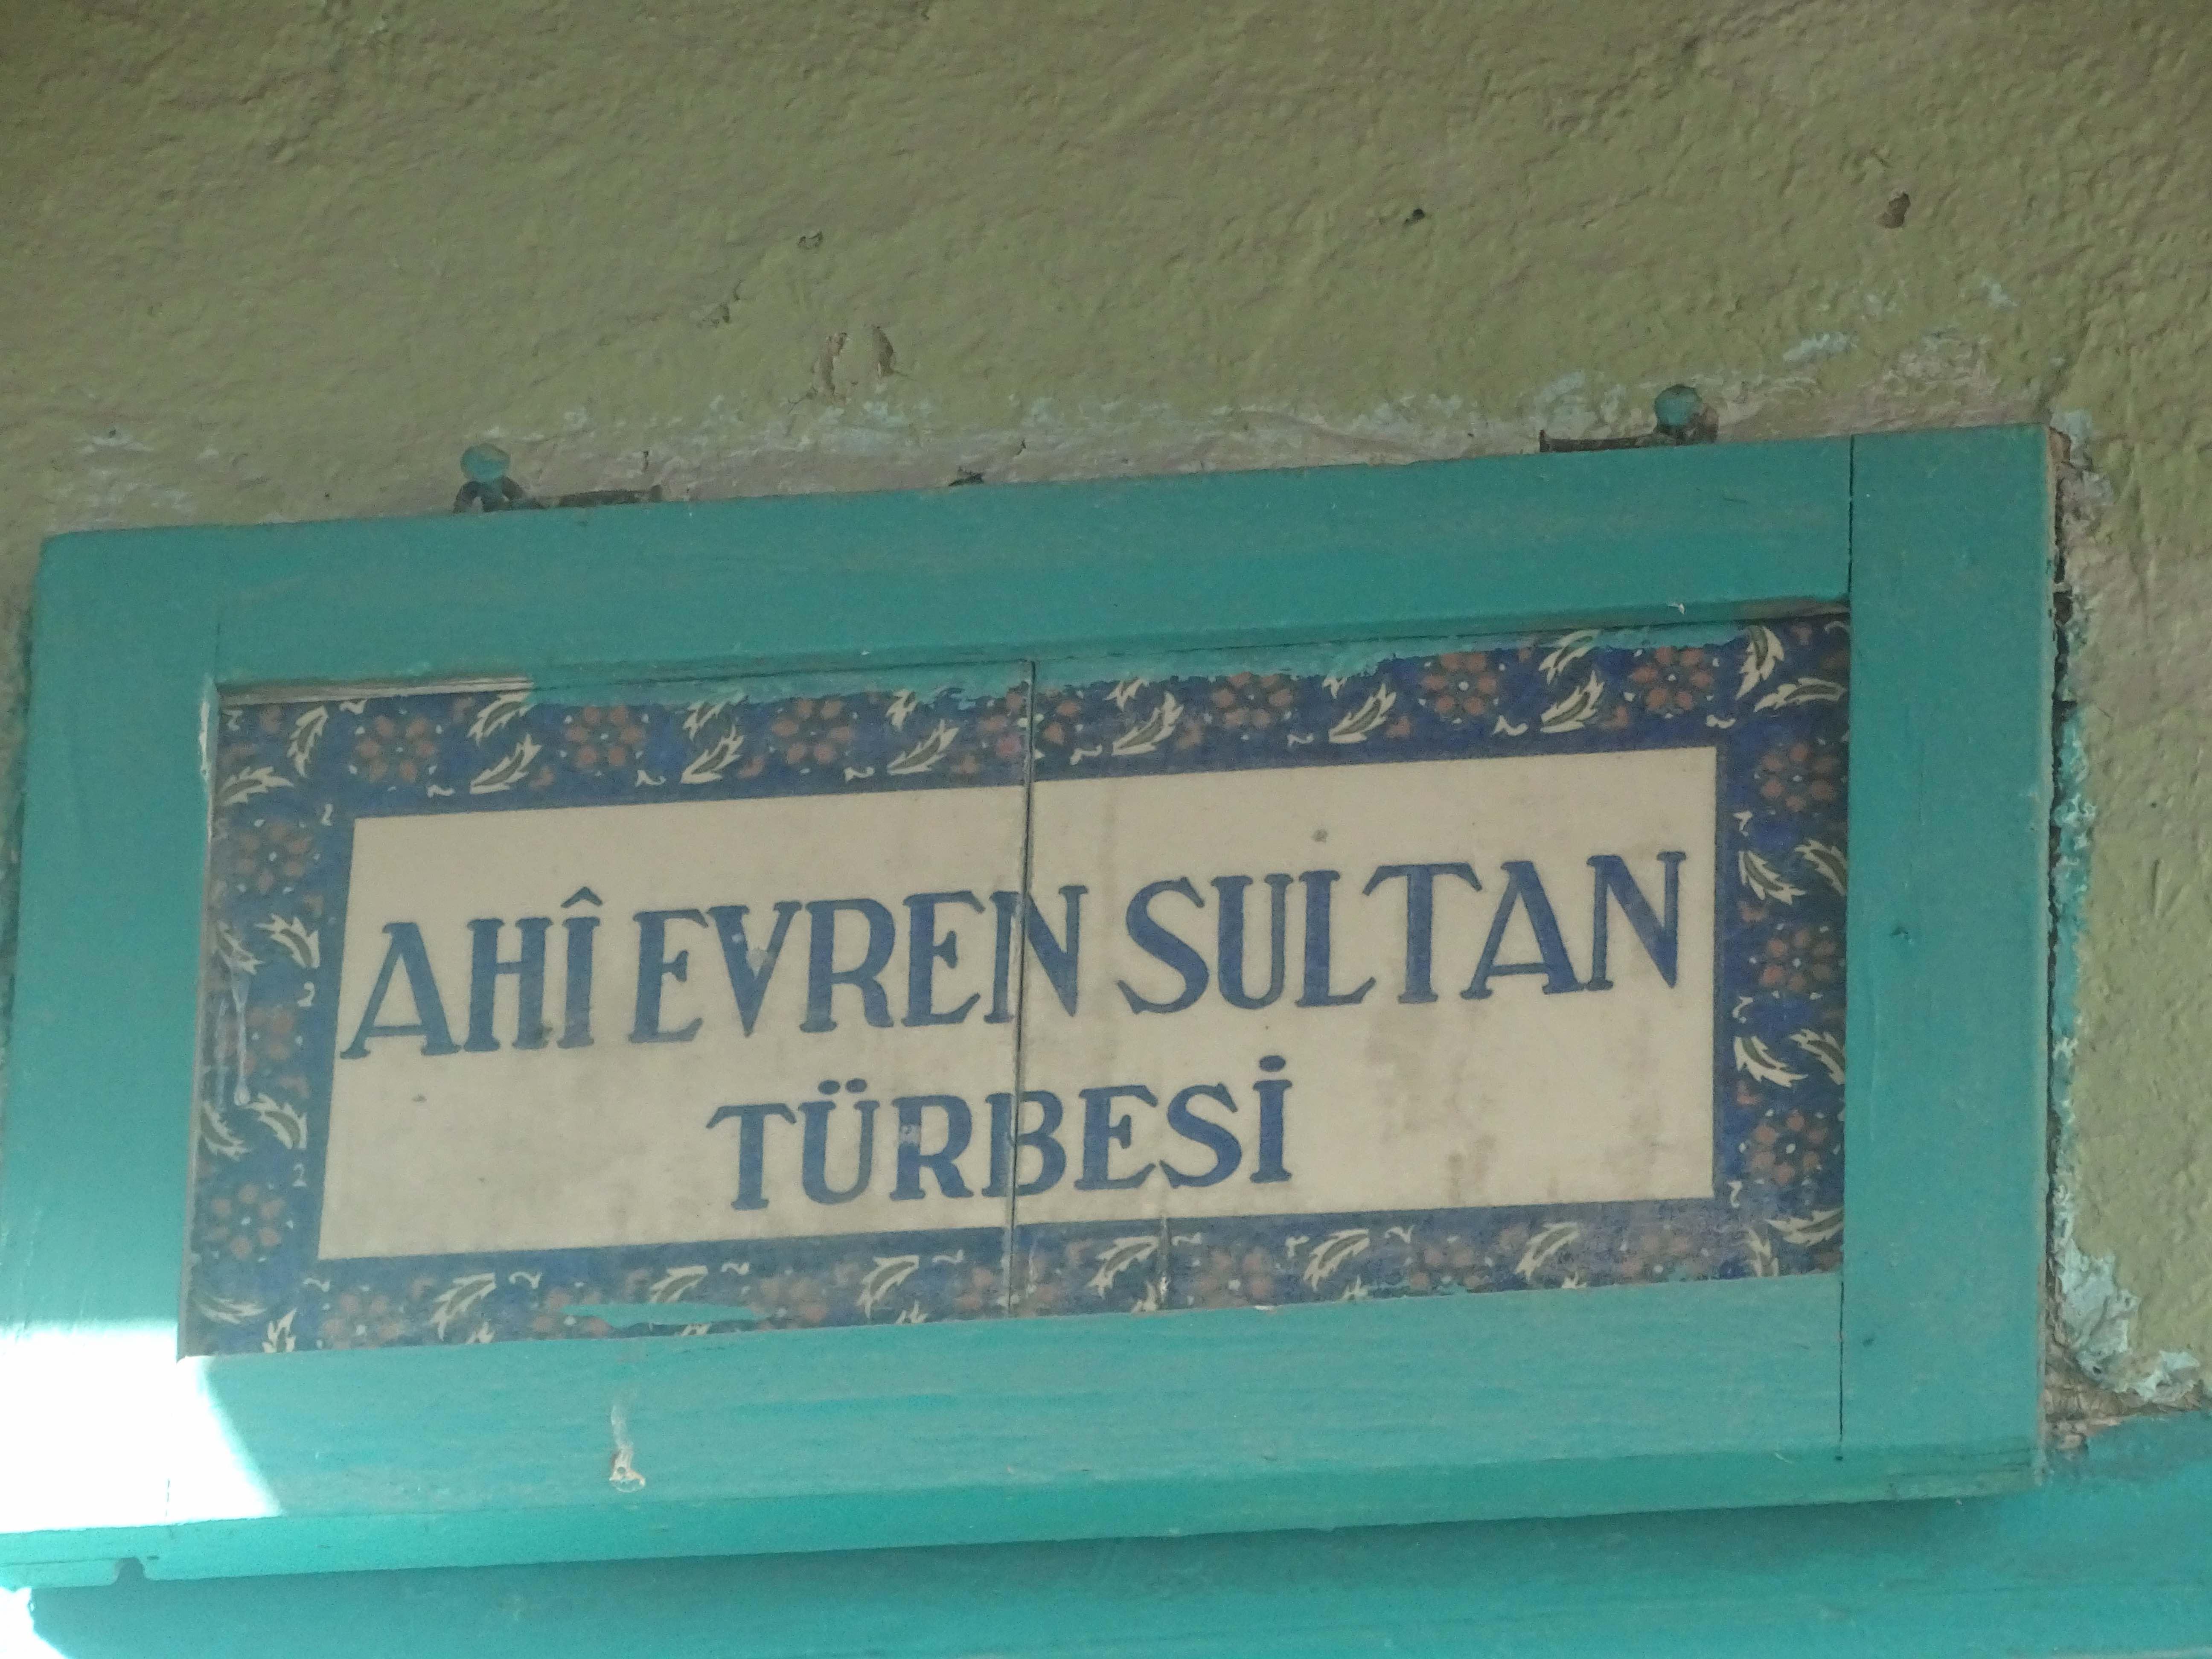 Ahi Evran Sultan